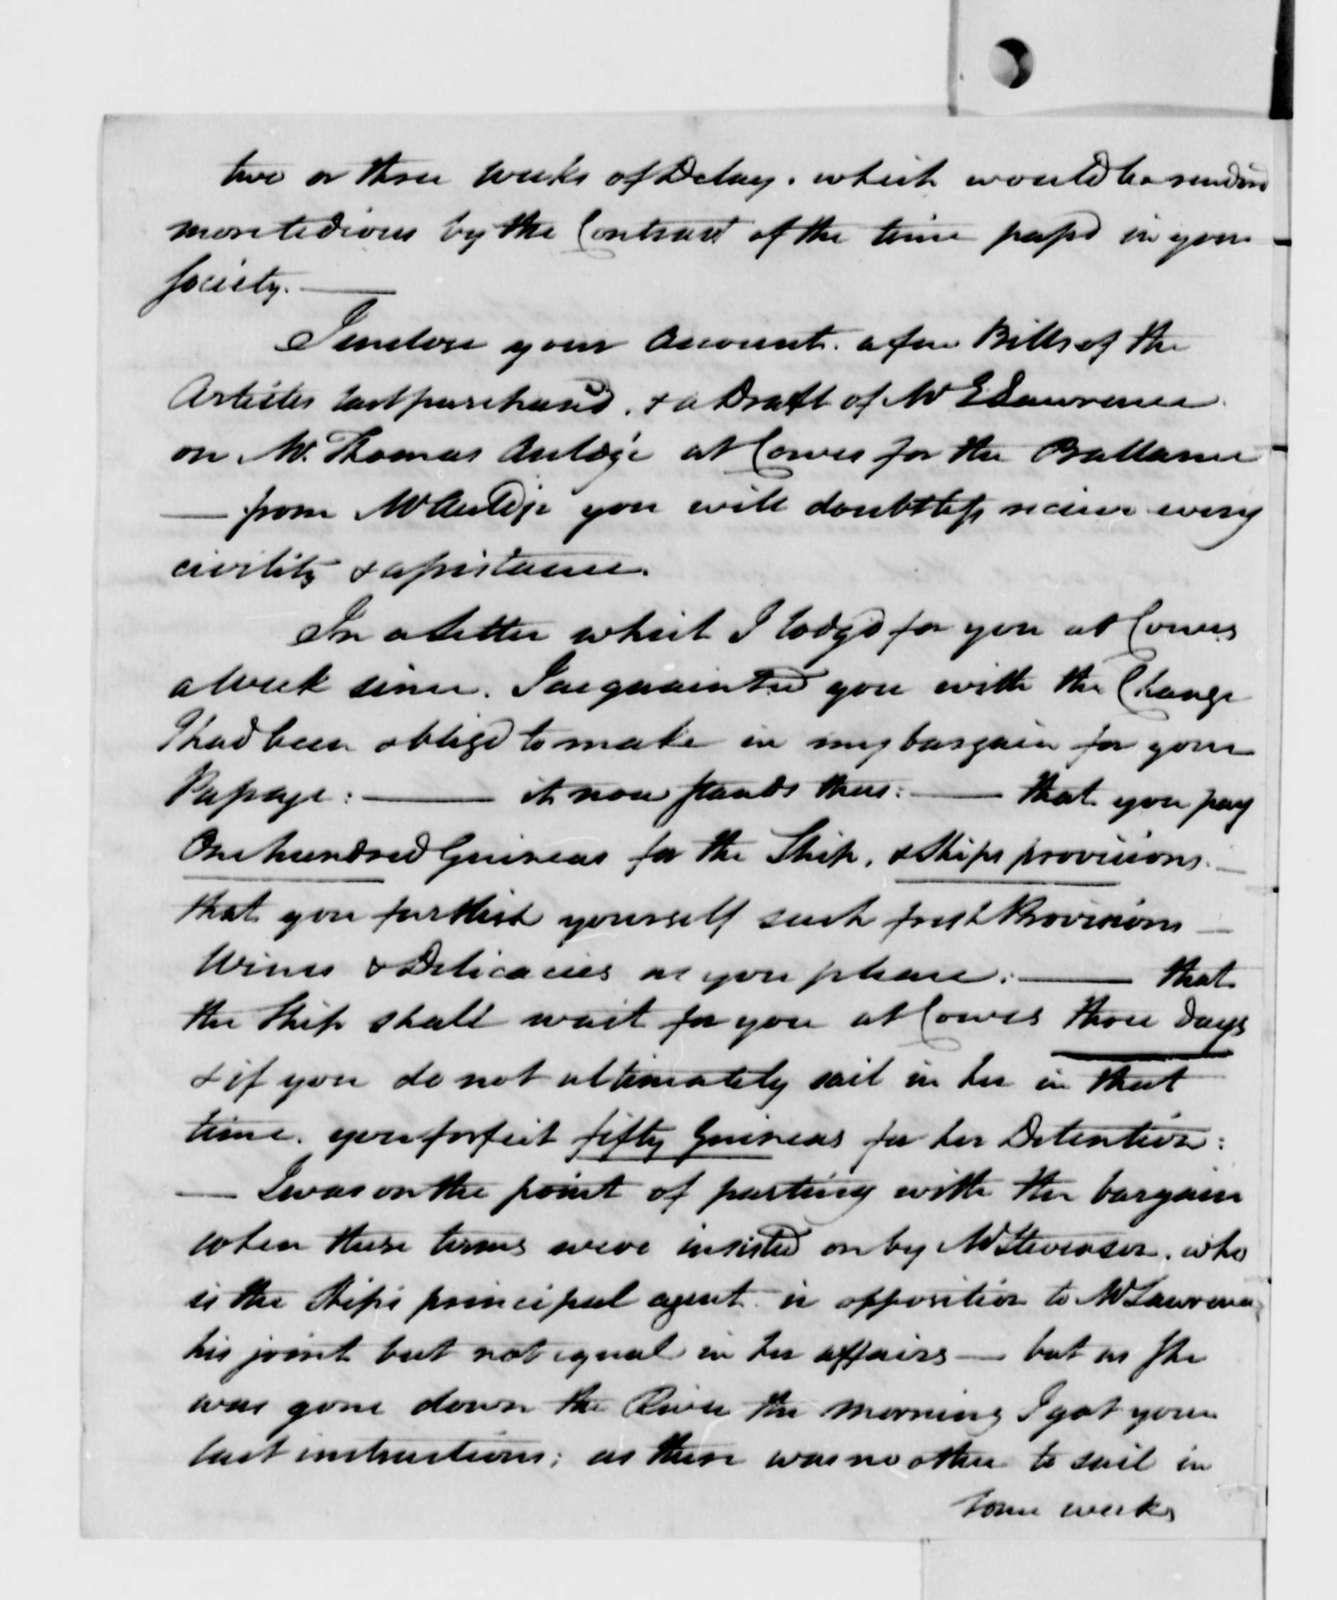 John Trumbull to Thomas Jefferson, October 10, 1789